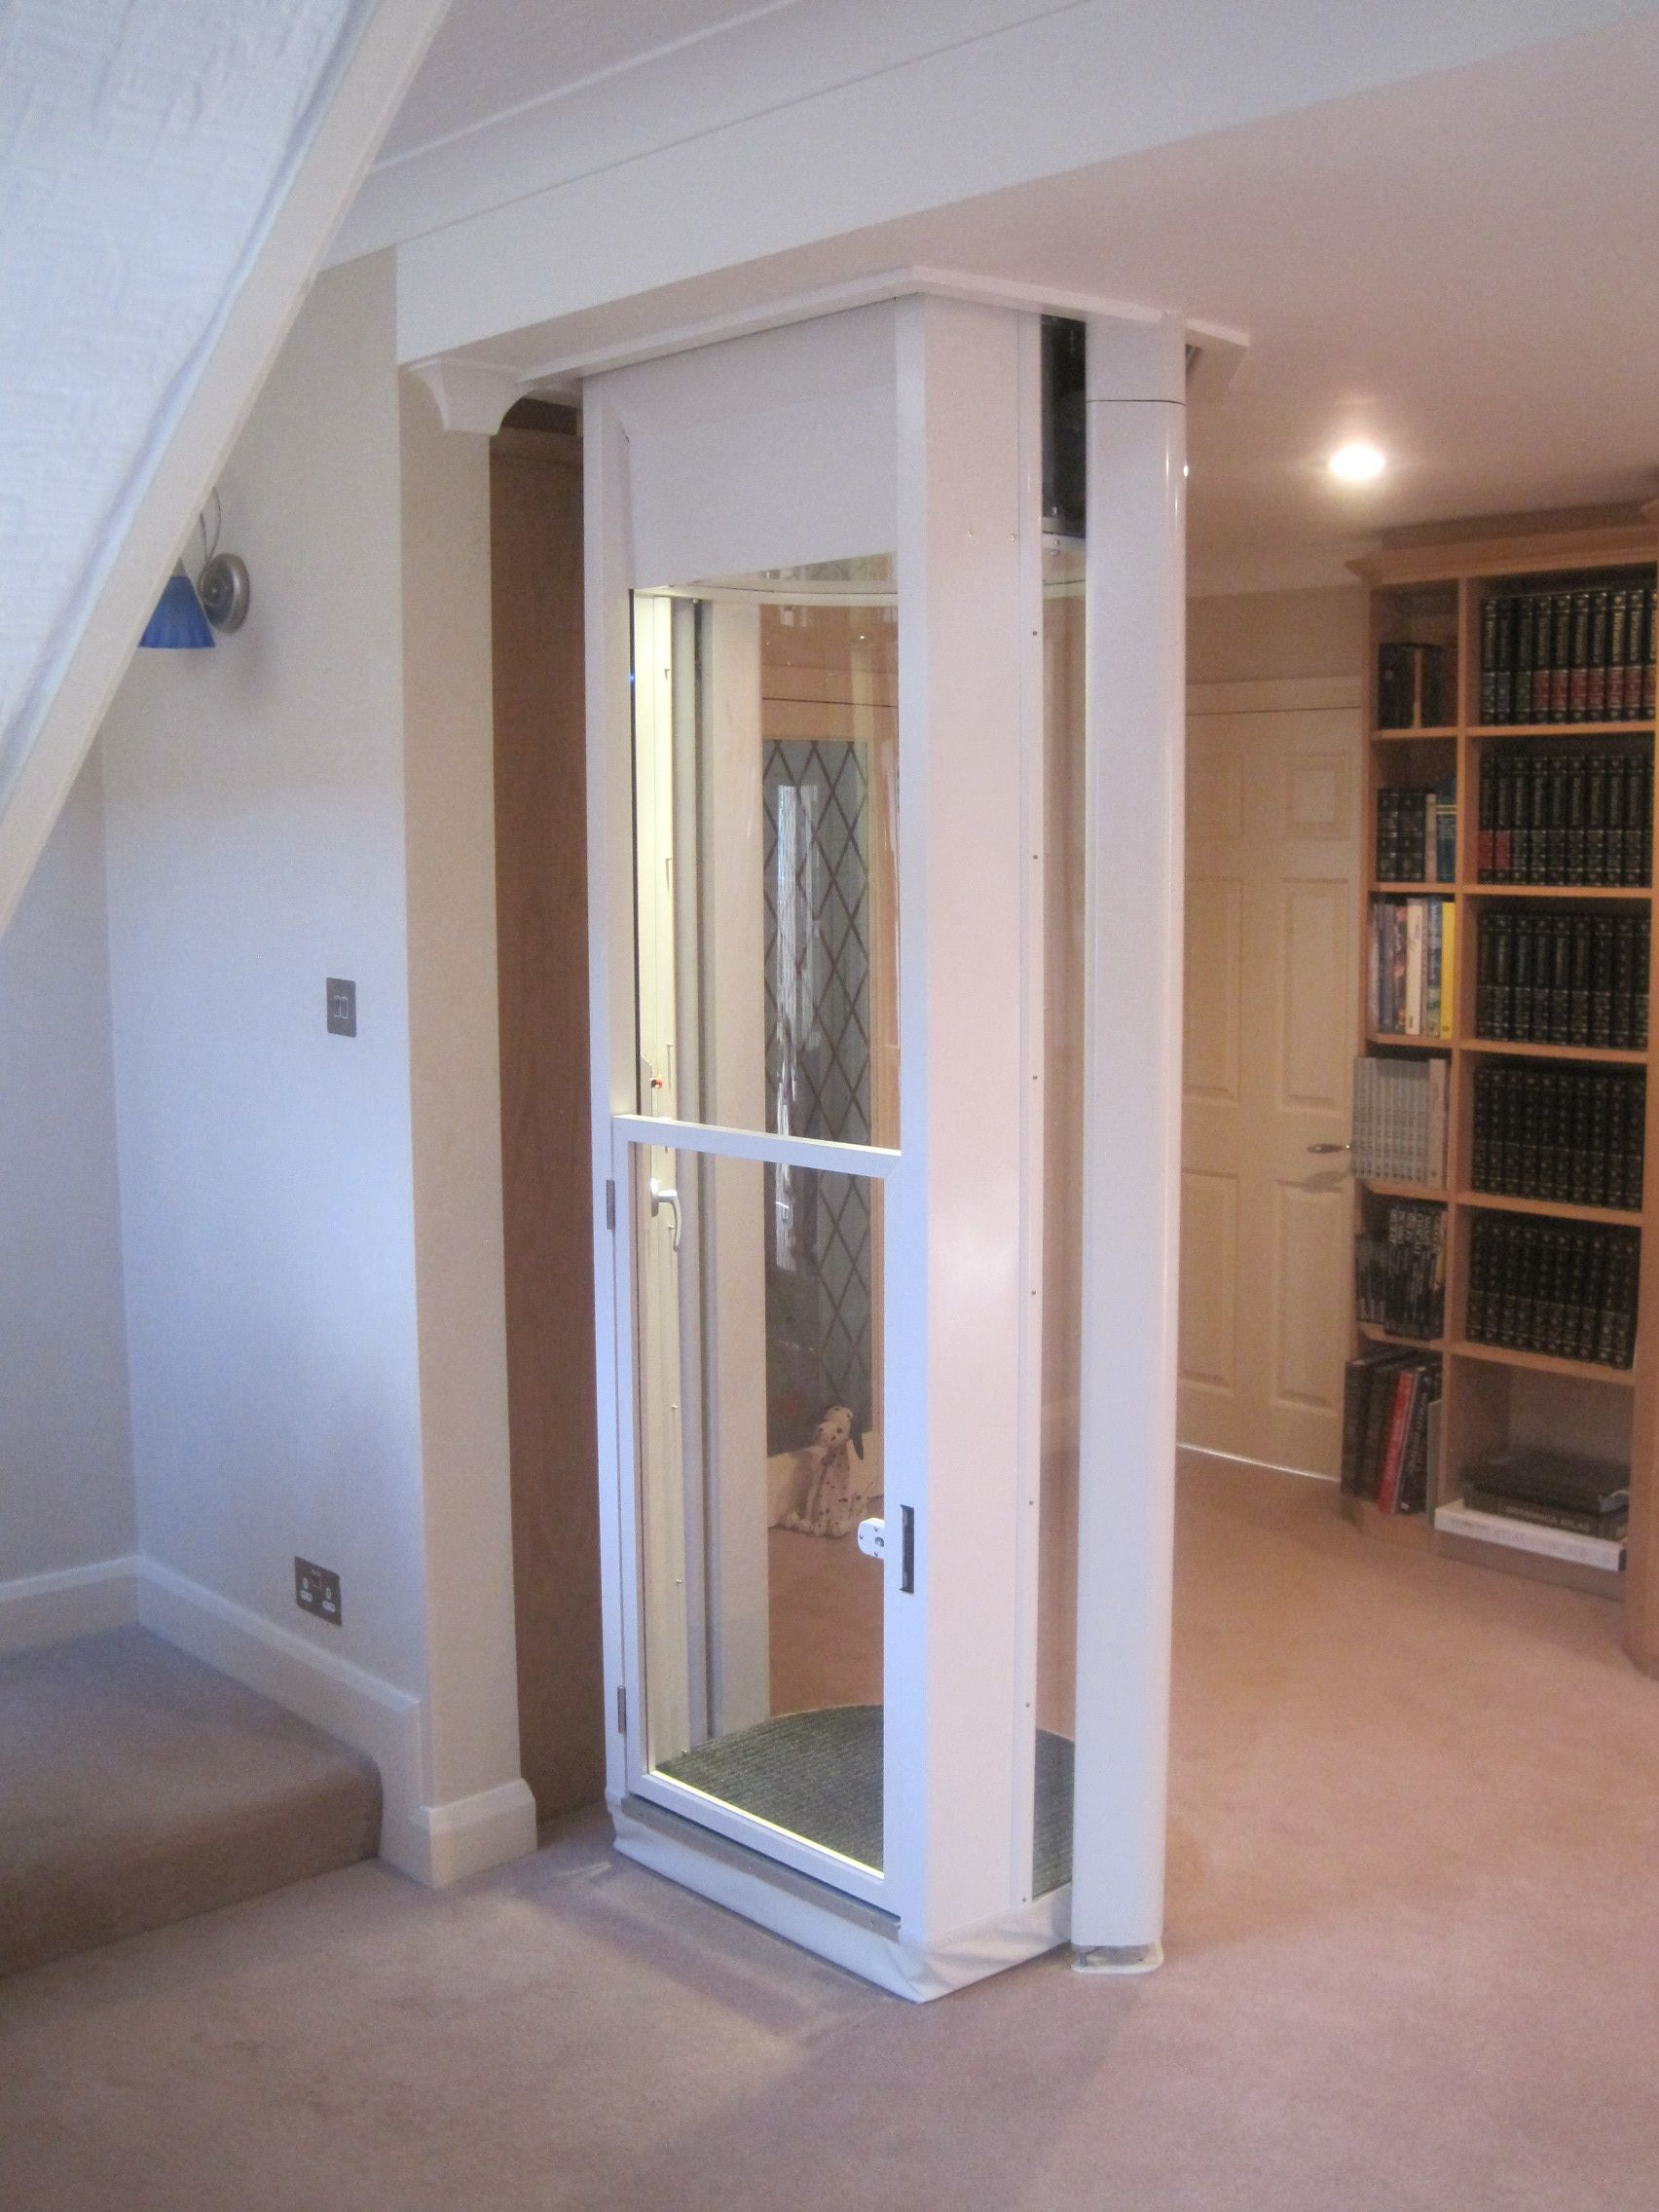 Stiltz Home Lift Stilts Home Lift In 2019 House